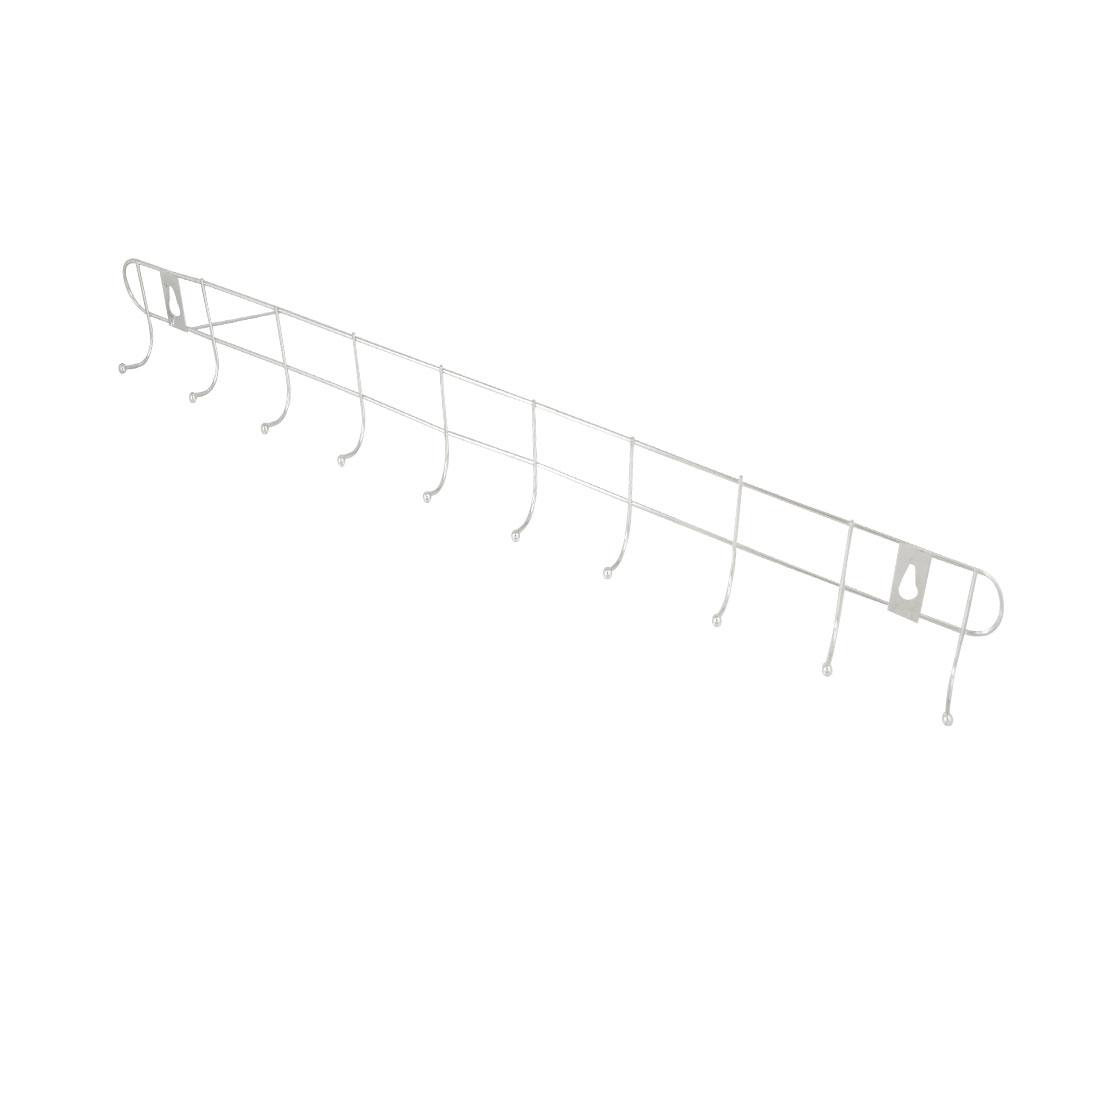 2 Pcs Bathroom Metal 10 Hooks Towel Coat Hanger Wall Rack Silver Tone